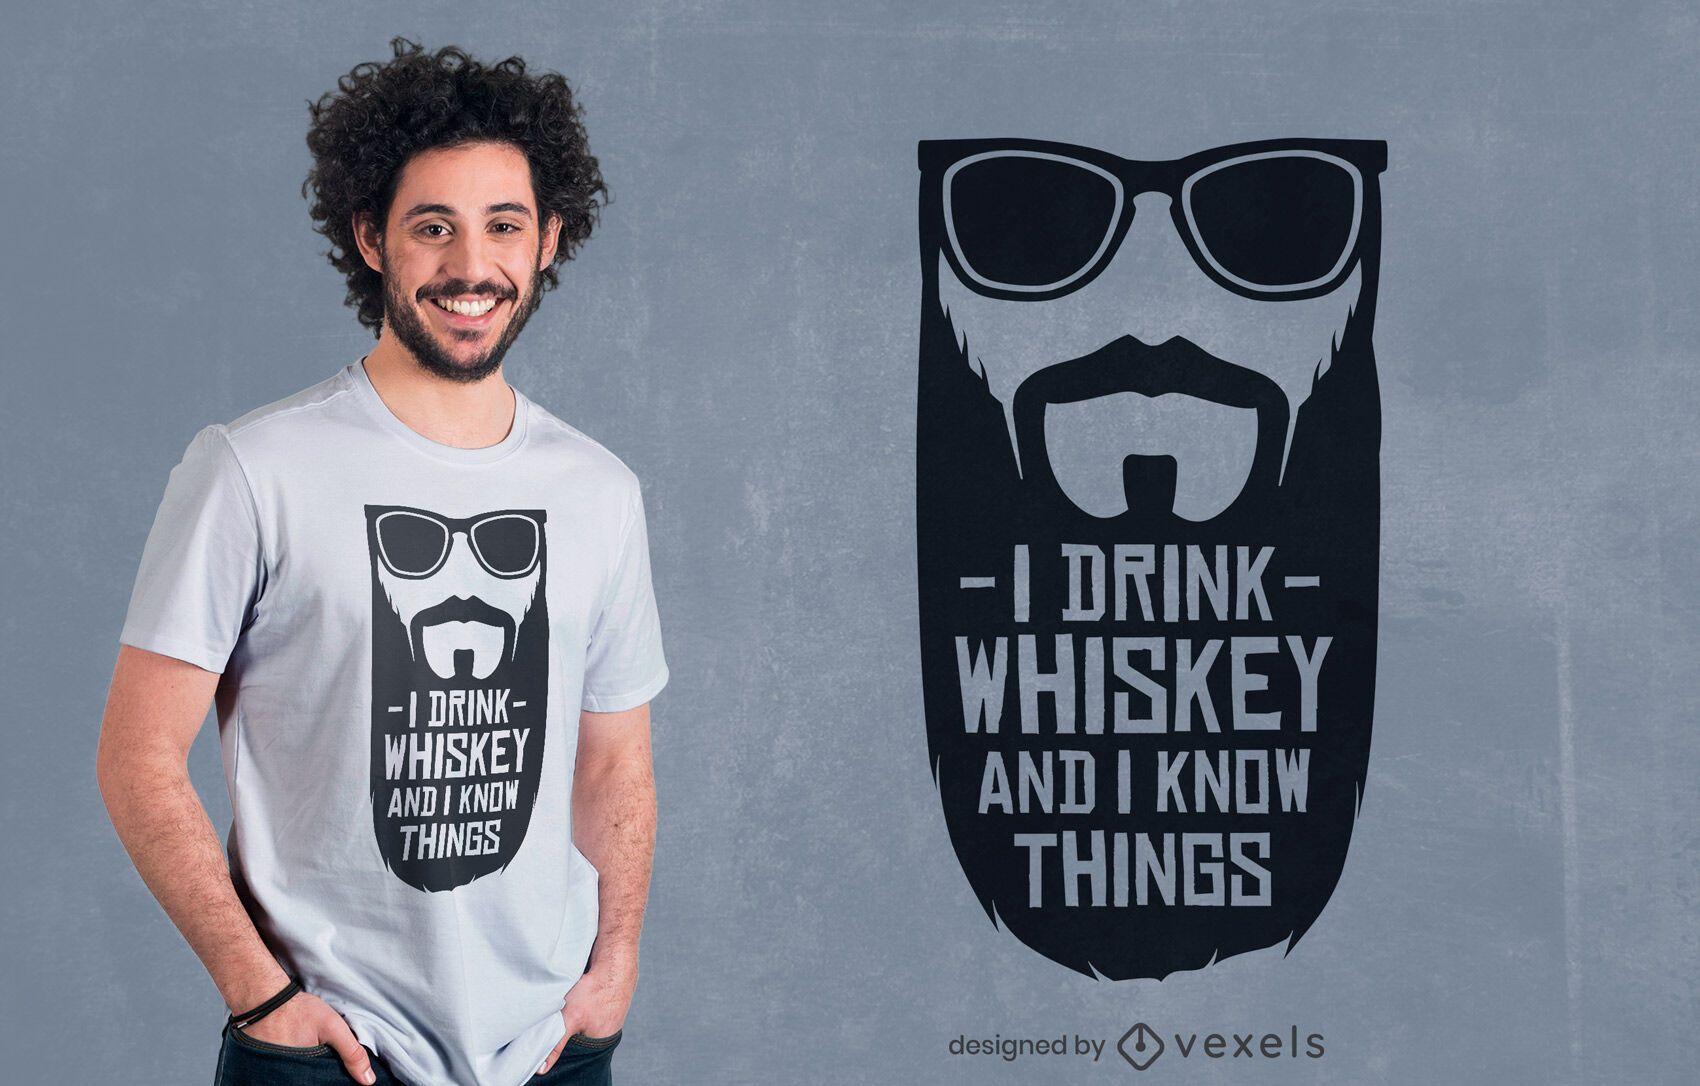 I drink whiskey t-shirt design